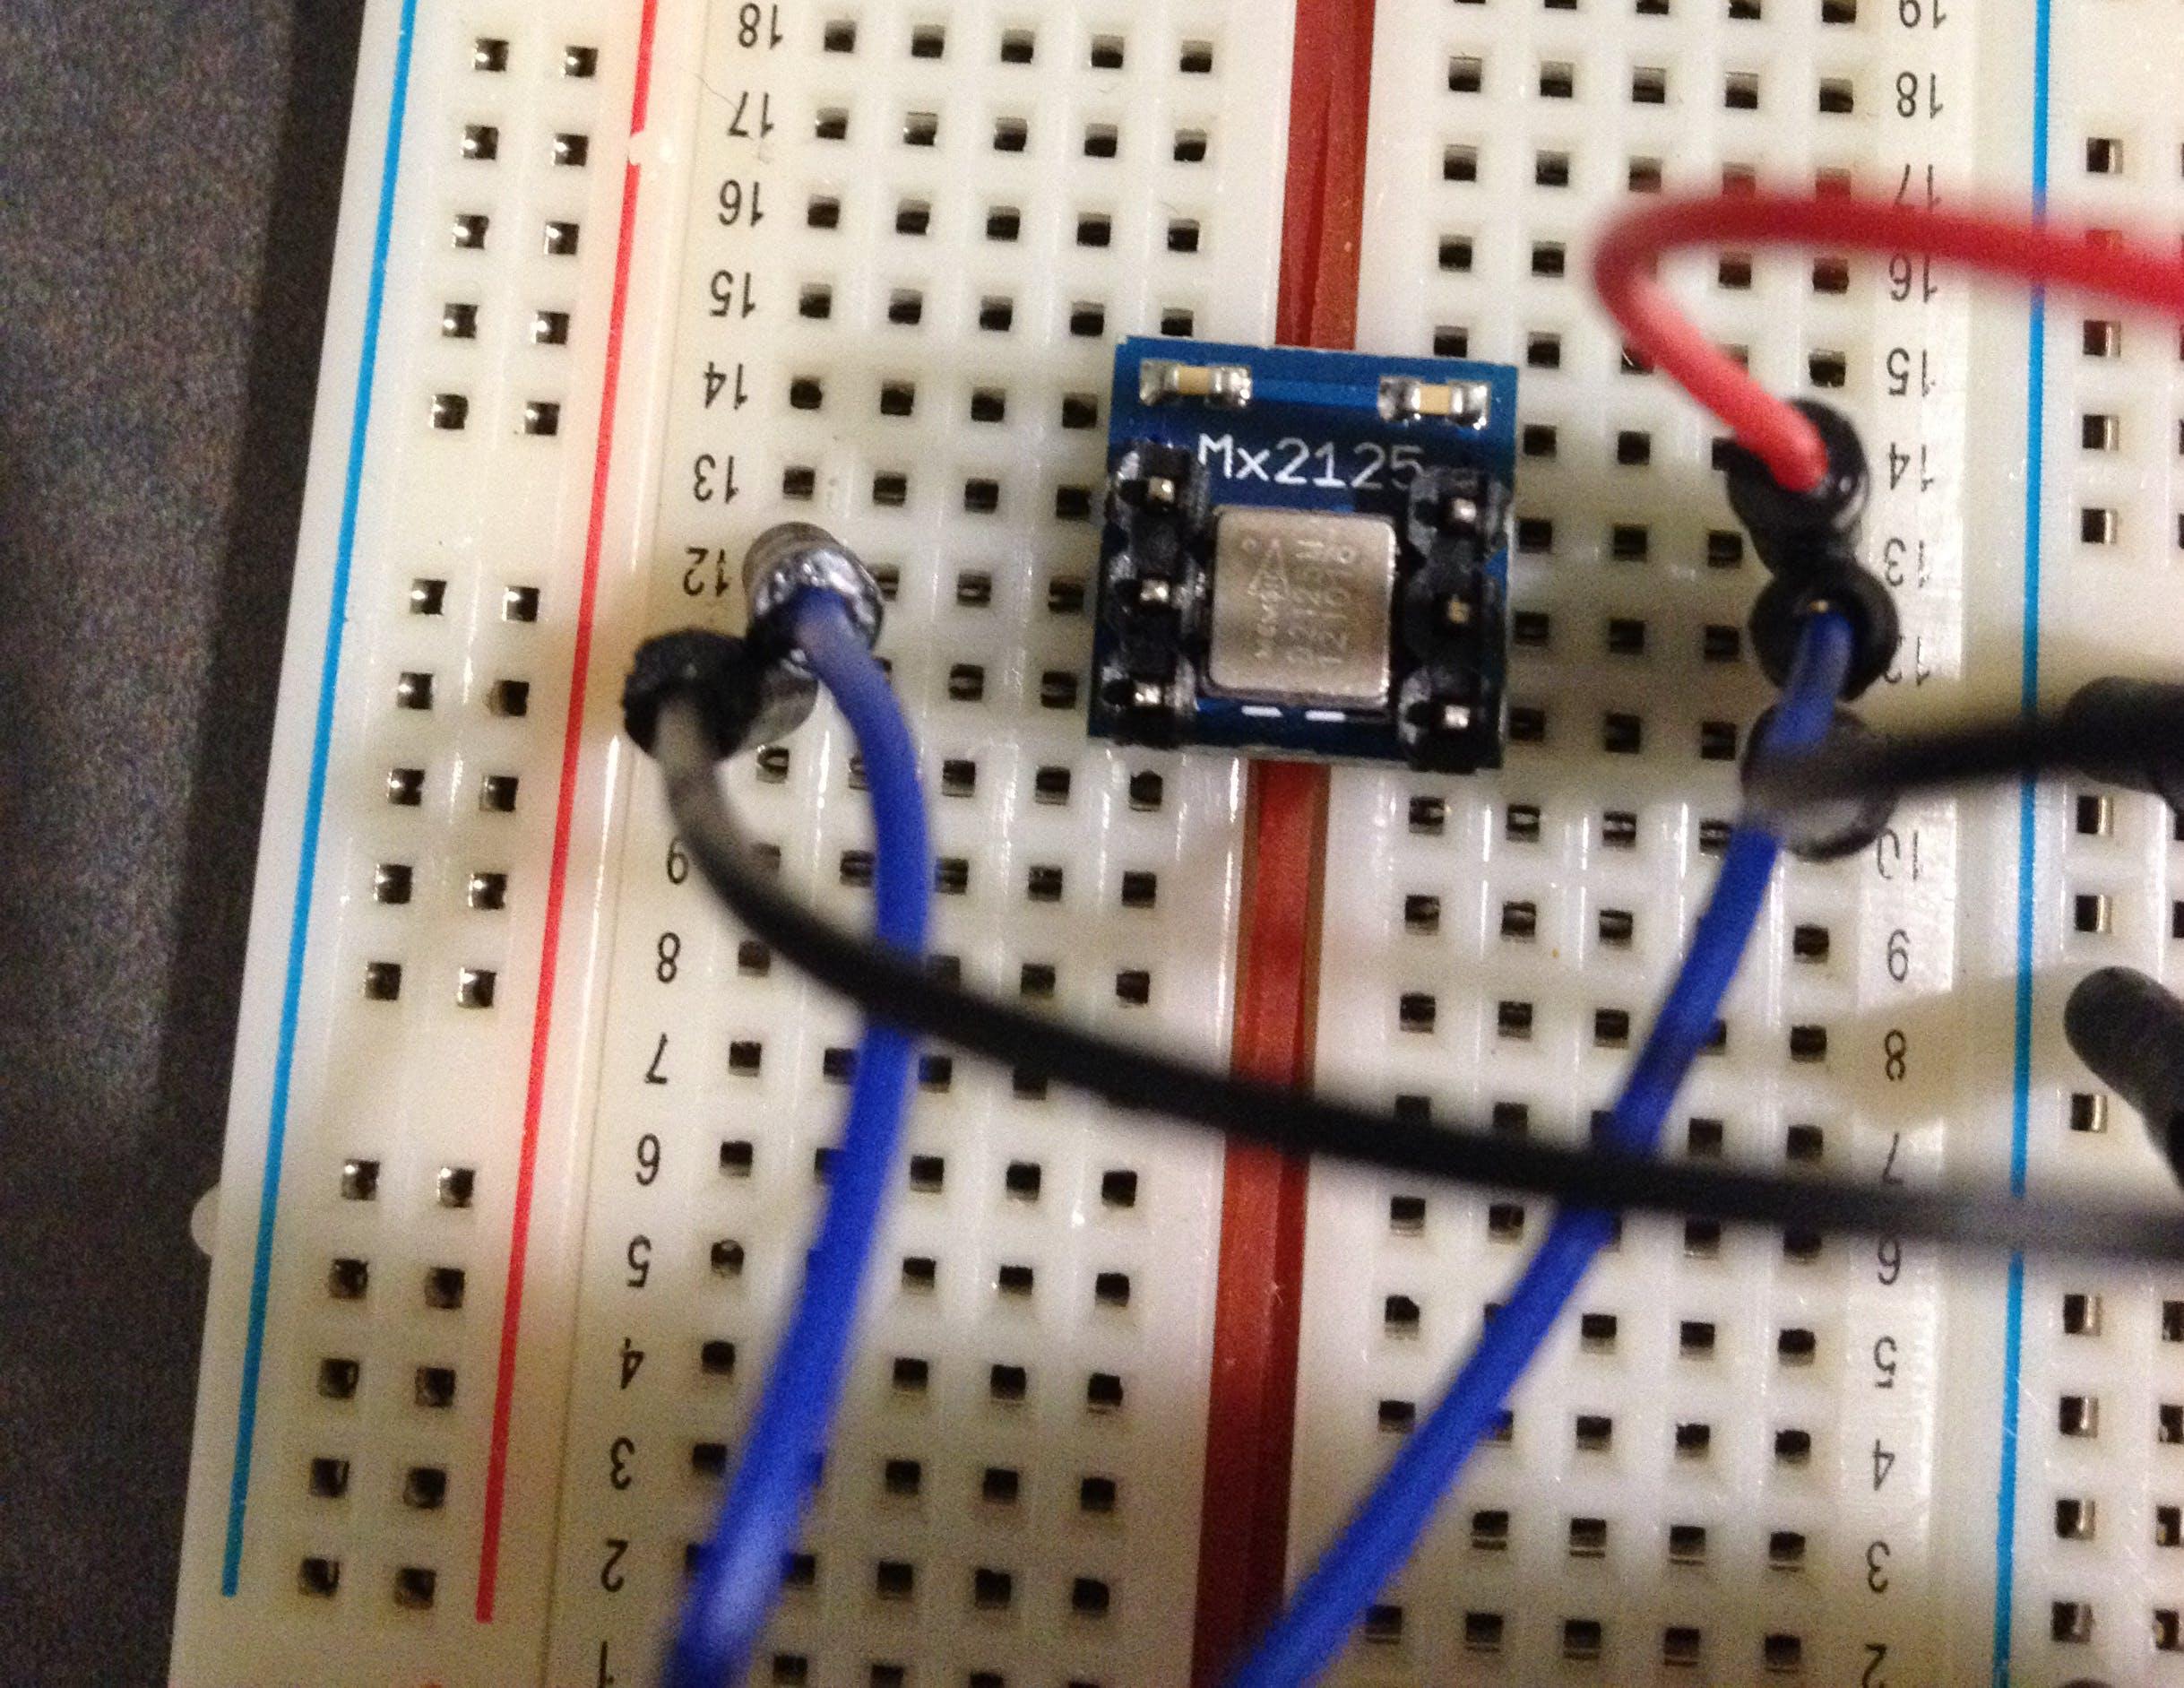 Memsic2125 Accelerometer (Mx2125)